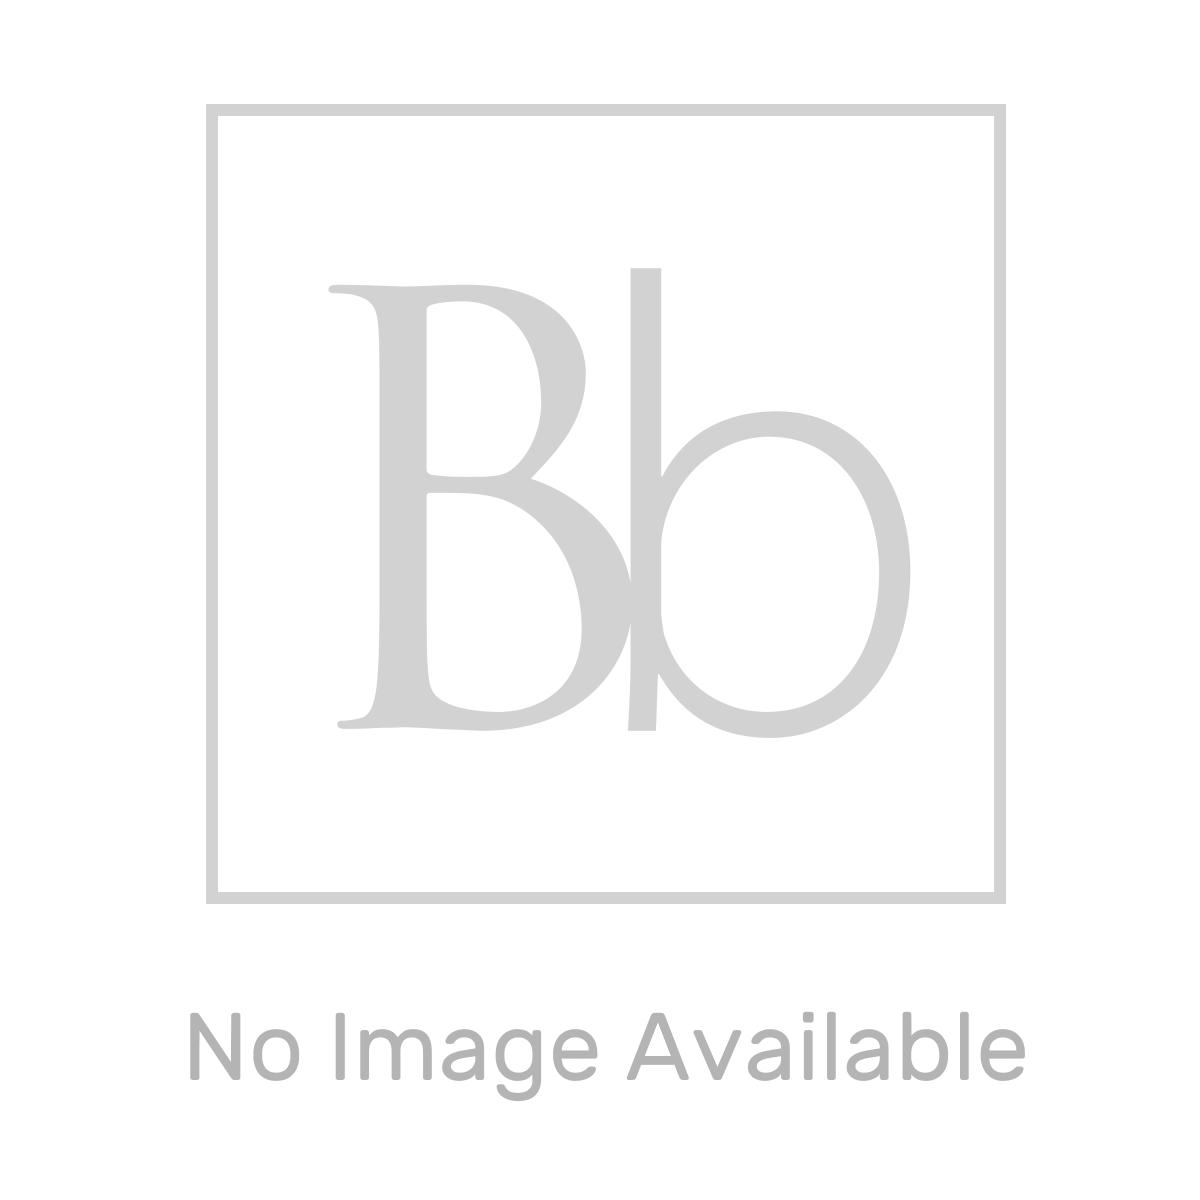 Sanicom Heavy Duty Pump